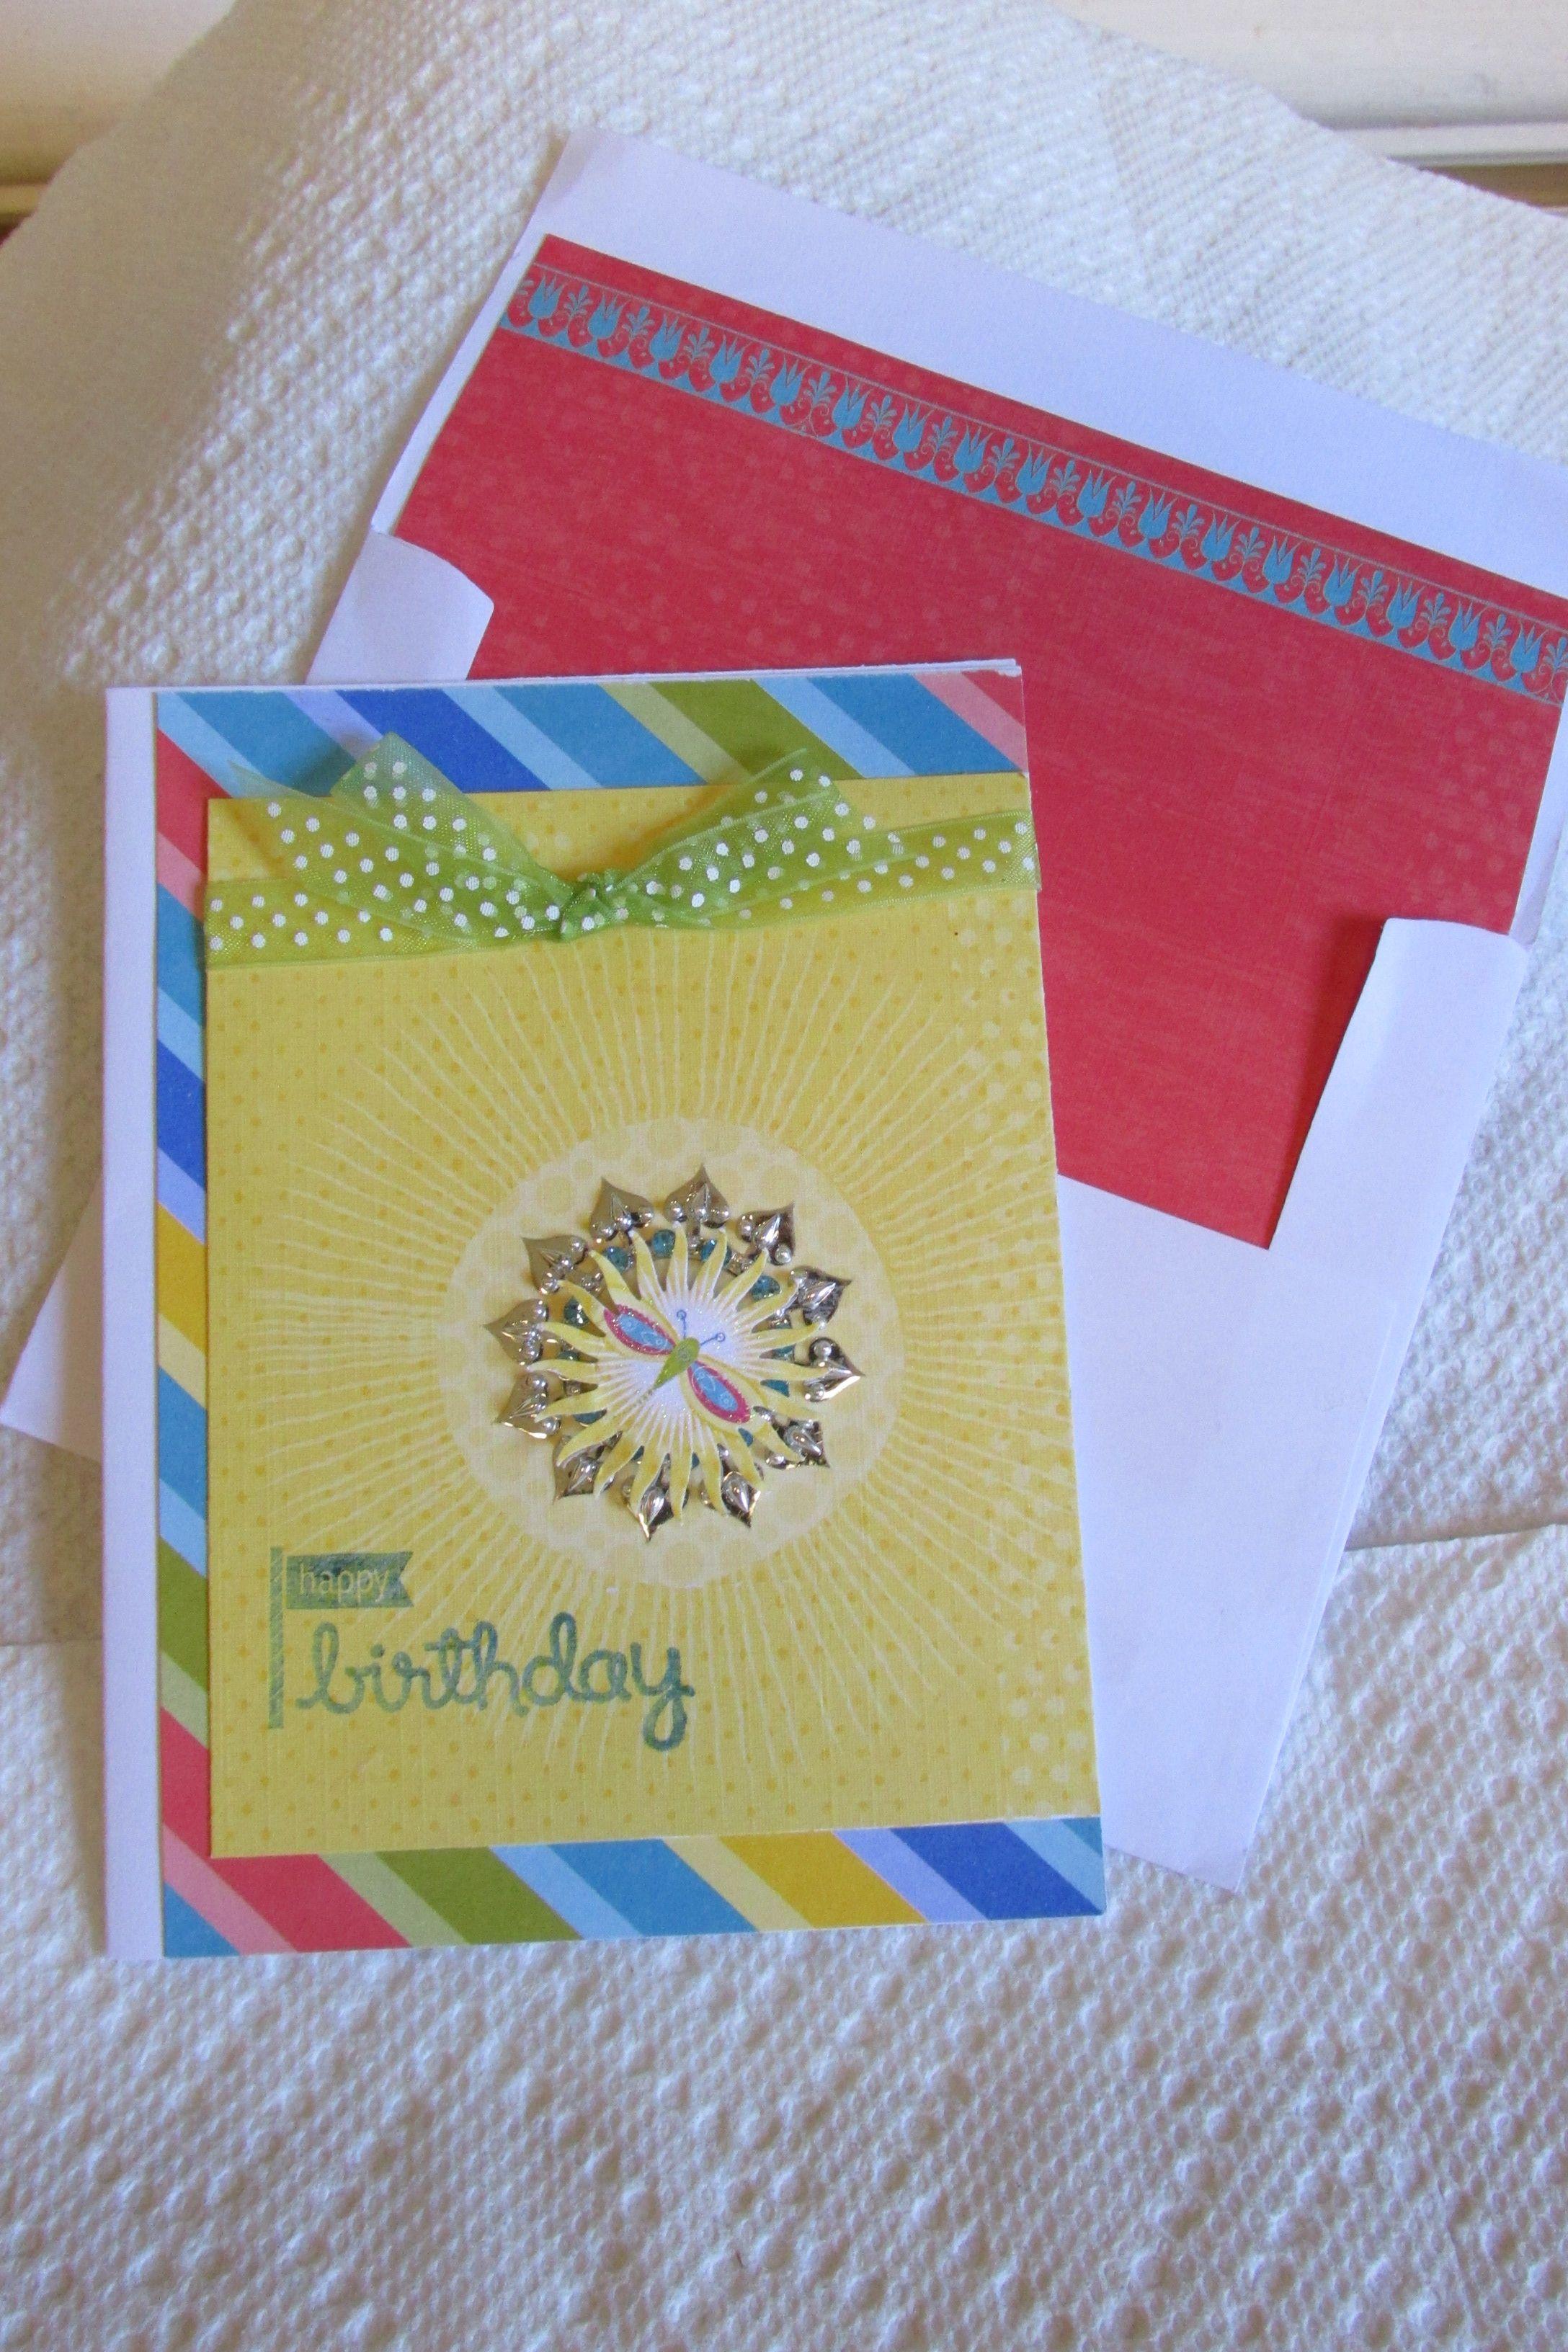 Firefly Birthday Card Stuff I Made Pinterest Fireflies